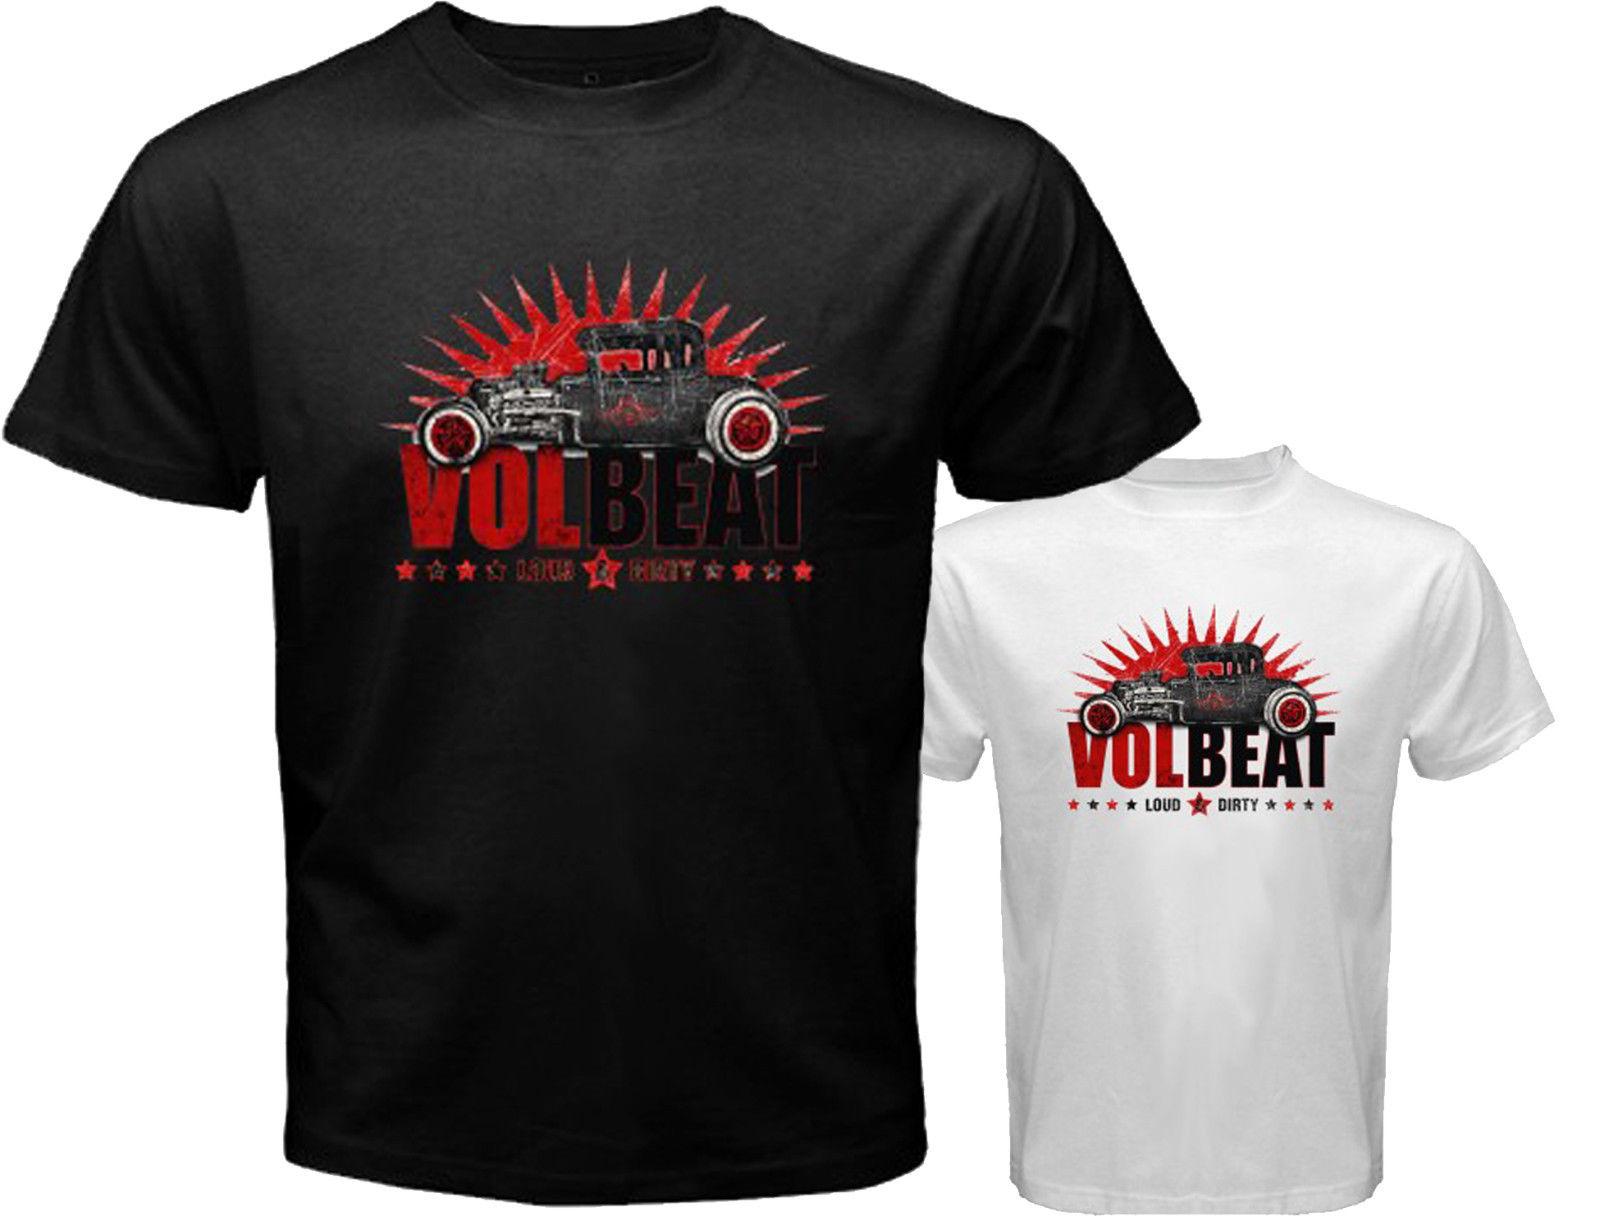 Dirty Shirt Band